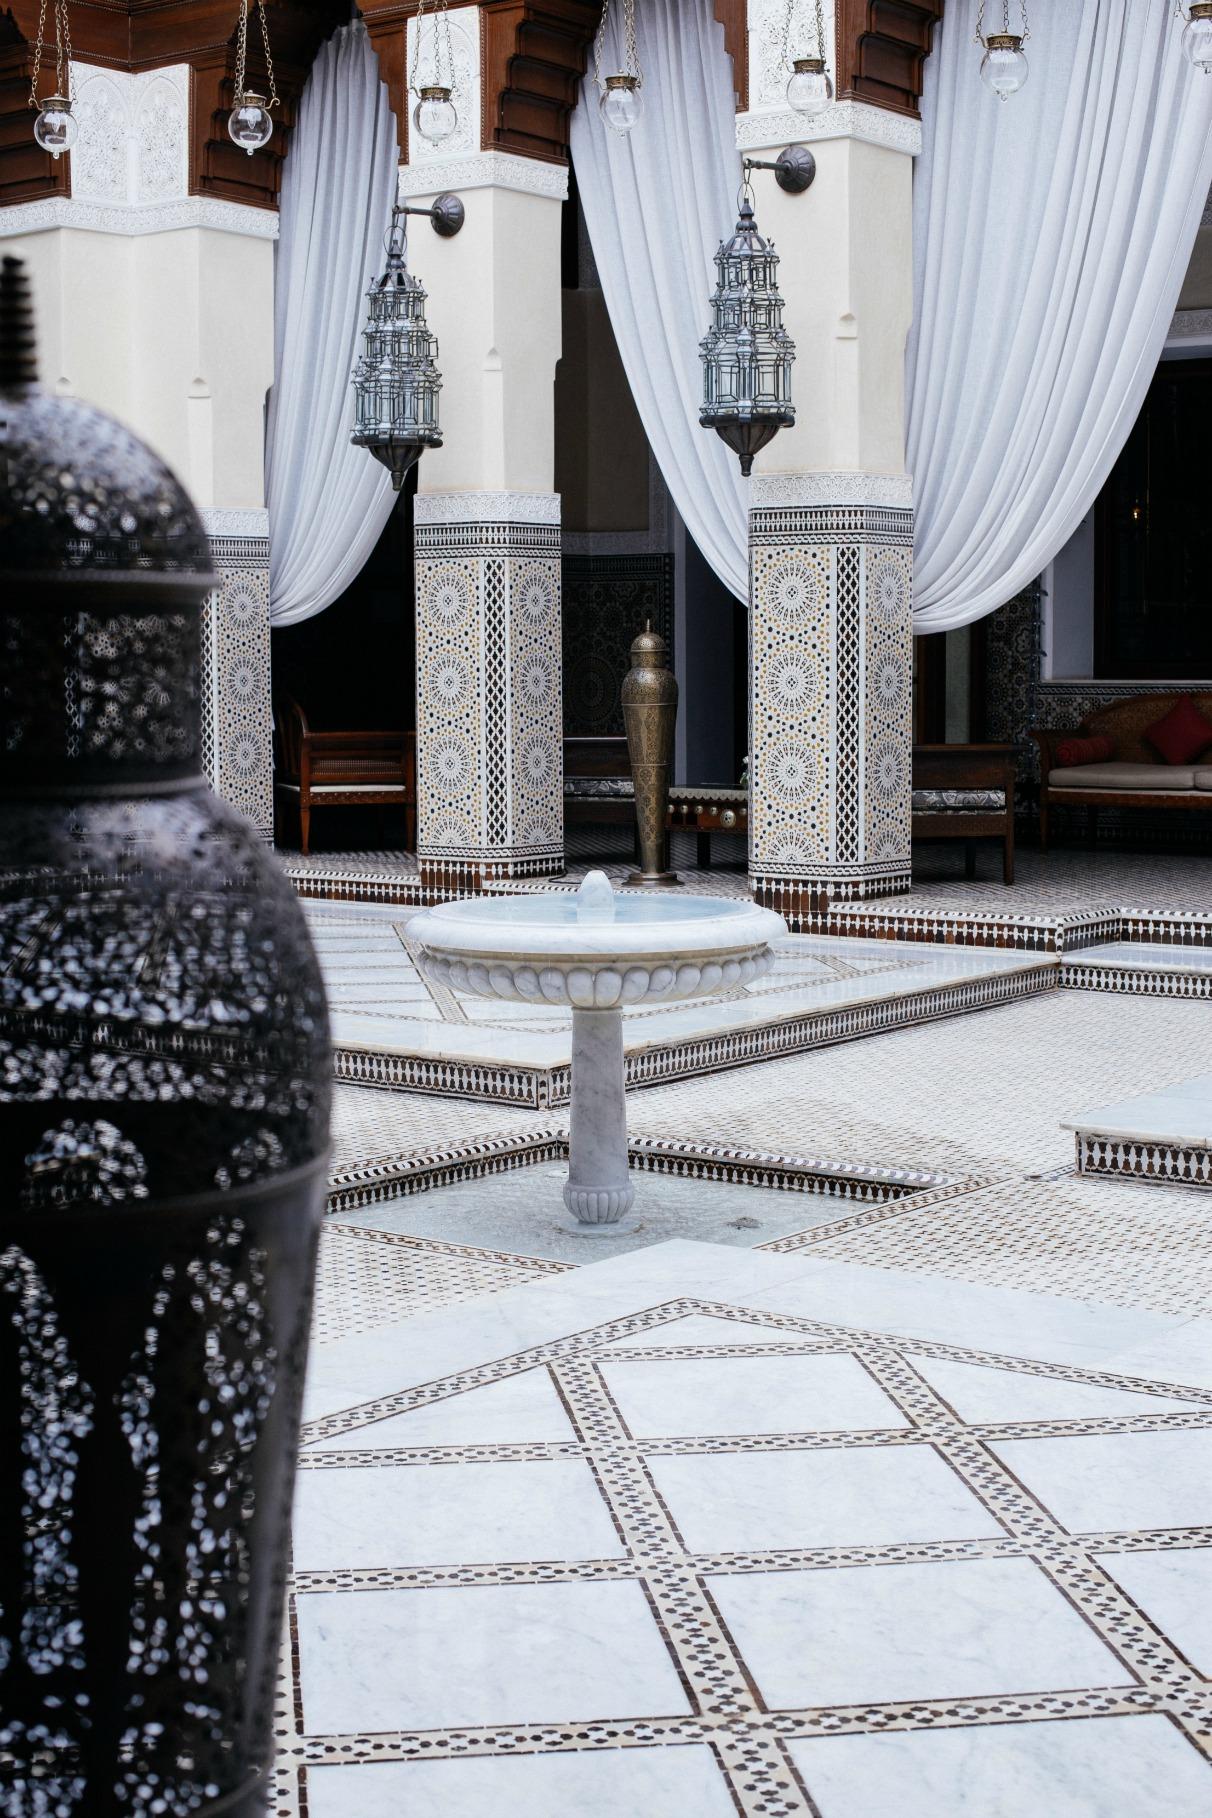 royal-mansour-hotel-luxury-marrakesch-marrakesh-morocco-edisa-shahini-disicouture-blog-0299222